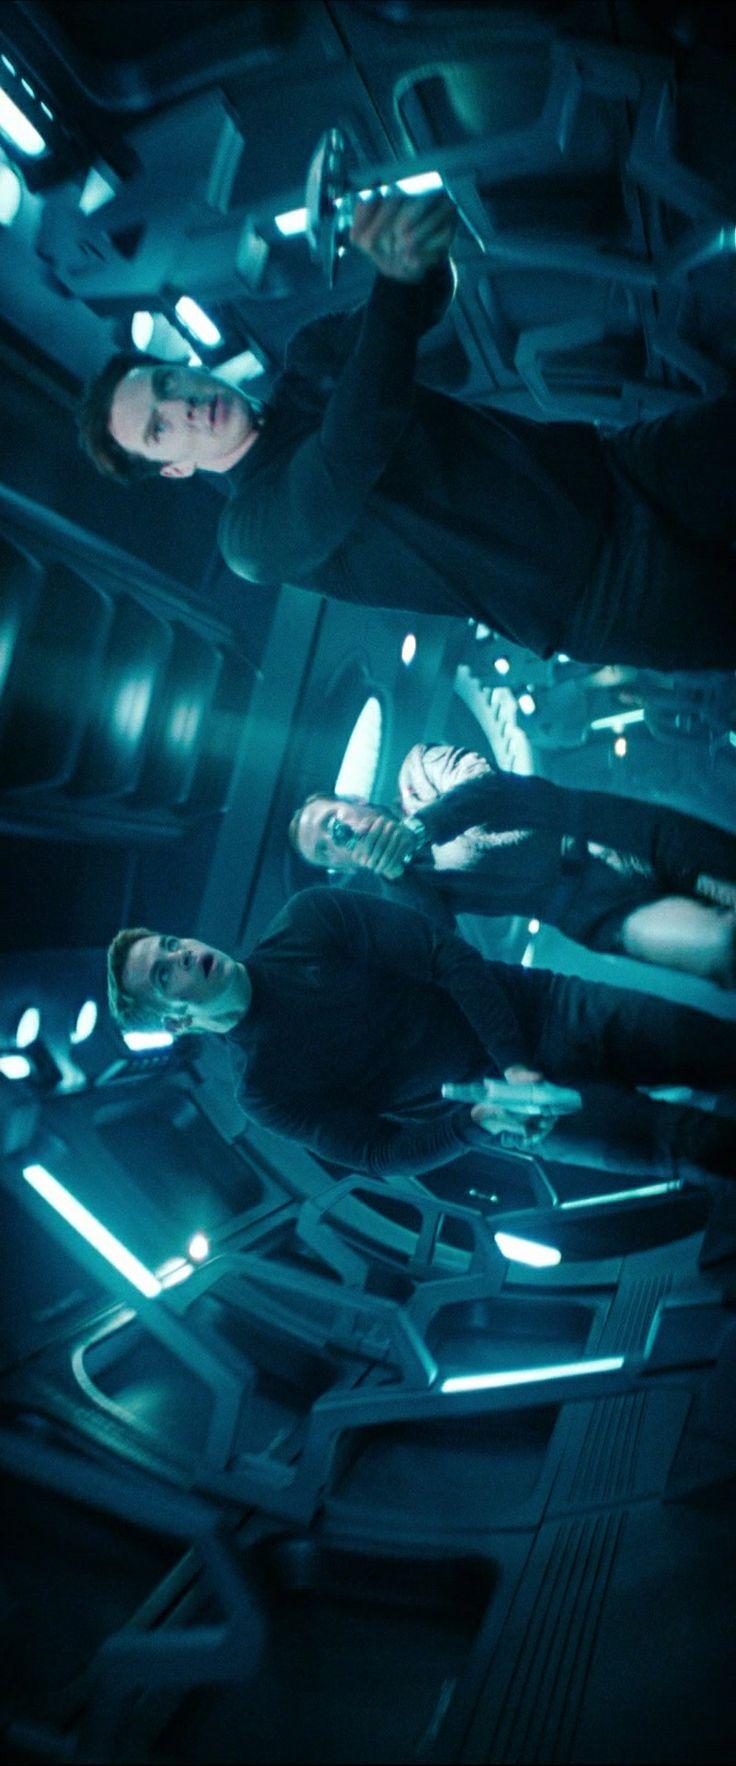 Benedict Cumberbatch, Chris Pine and Simon Pegg in Star Trek Into Darkness